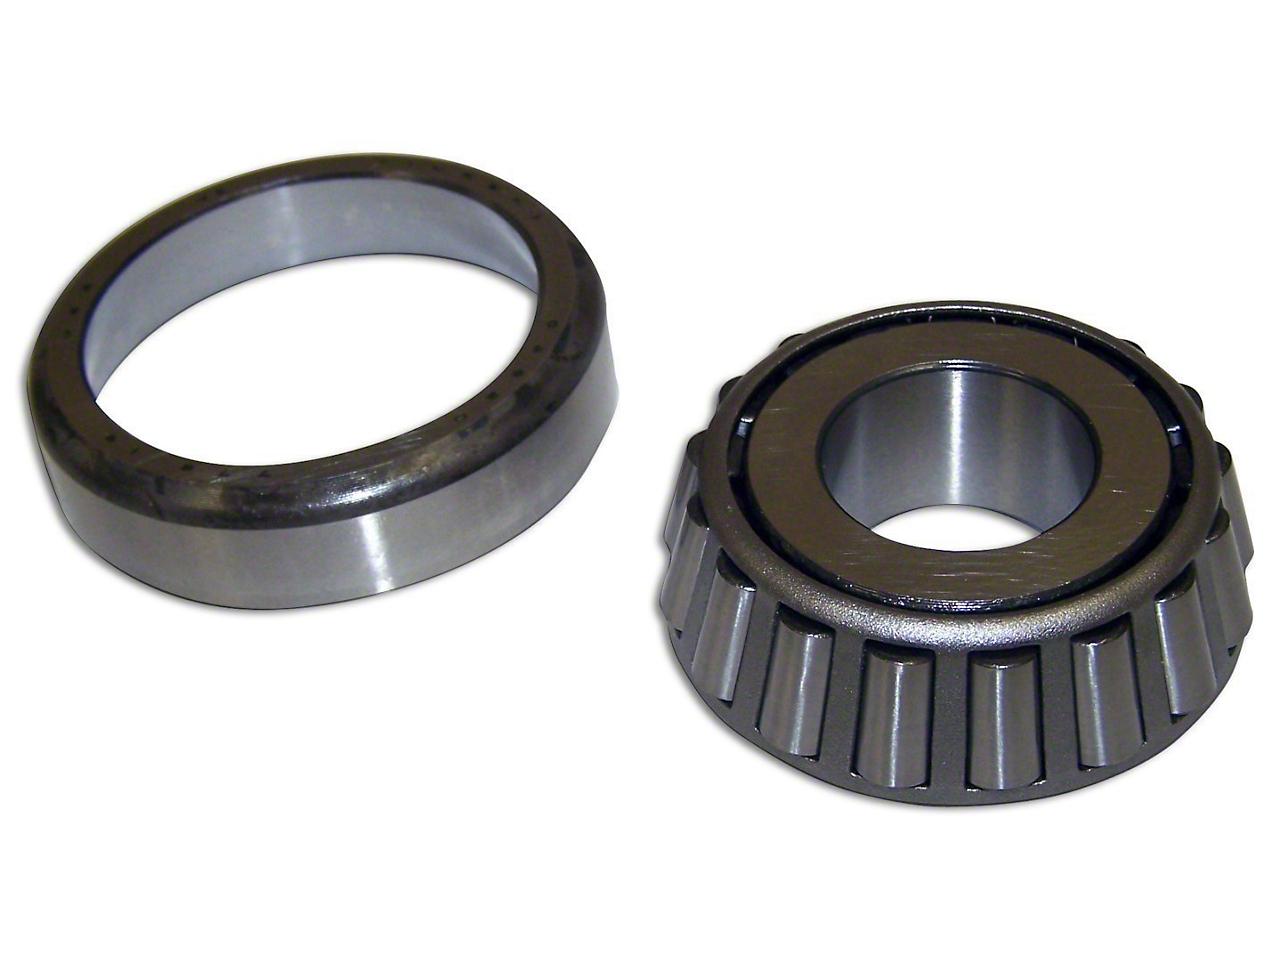 Dana 30/44 Axle Outer Pinion Bearing Set (87-95 Wrangler YJ)